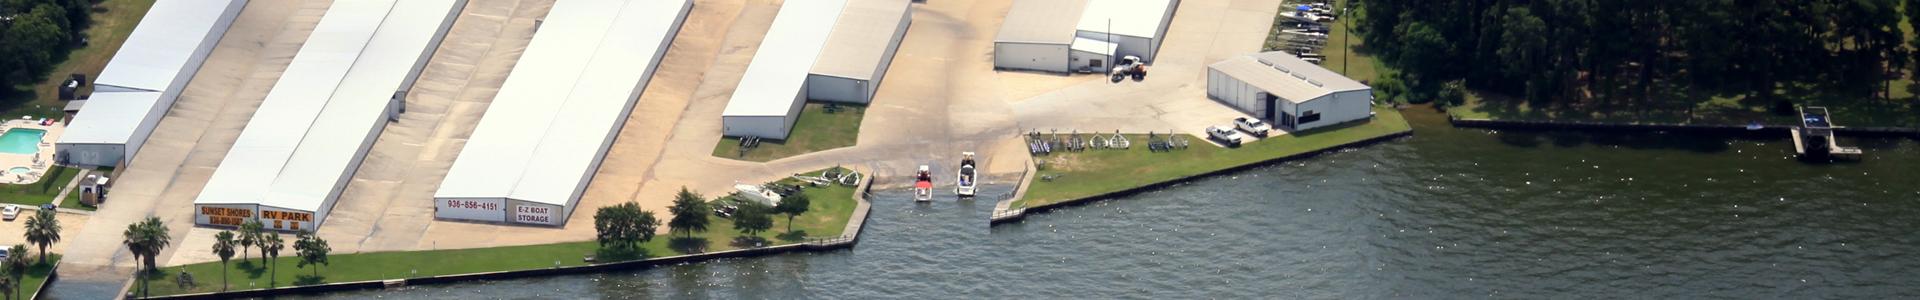 E-Z Boat Storage & Valet Launch